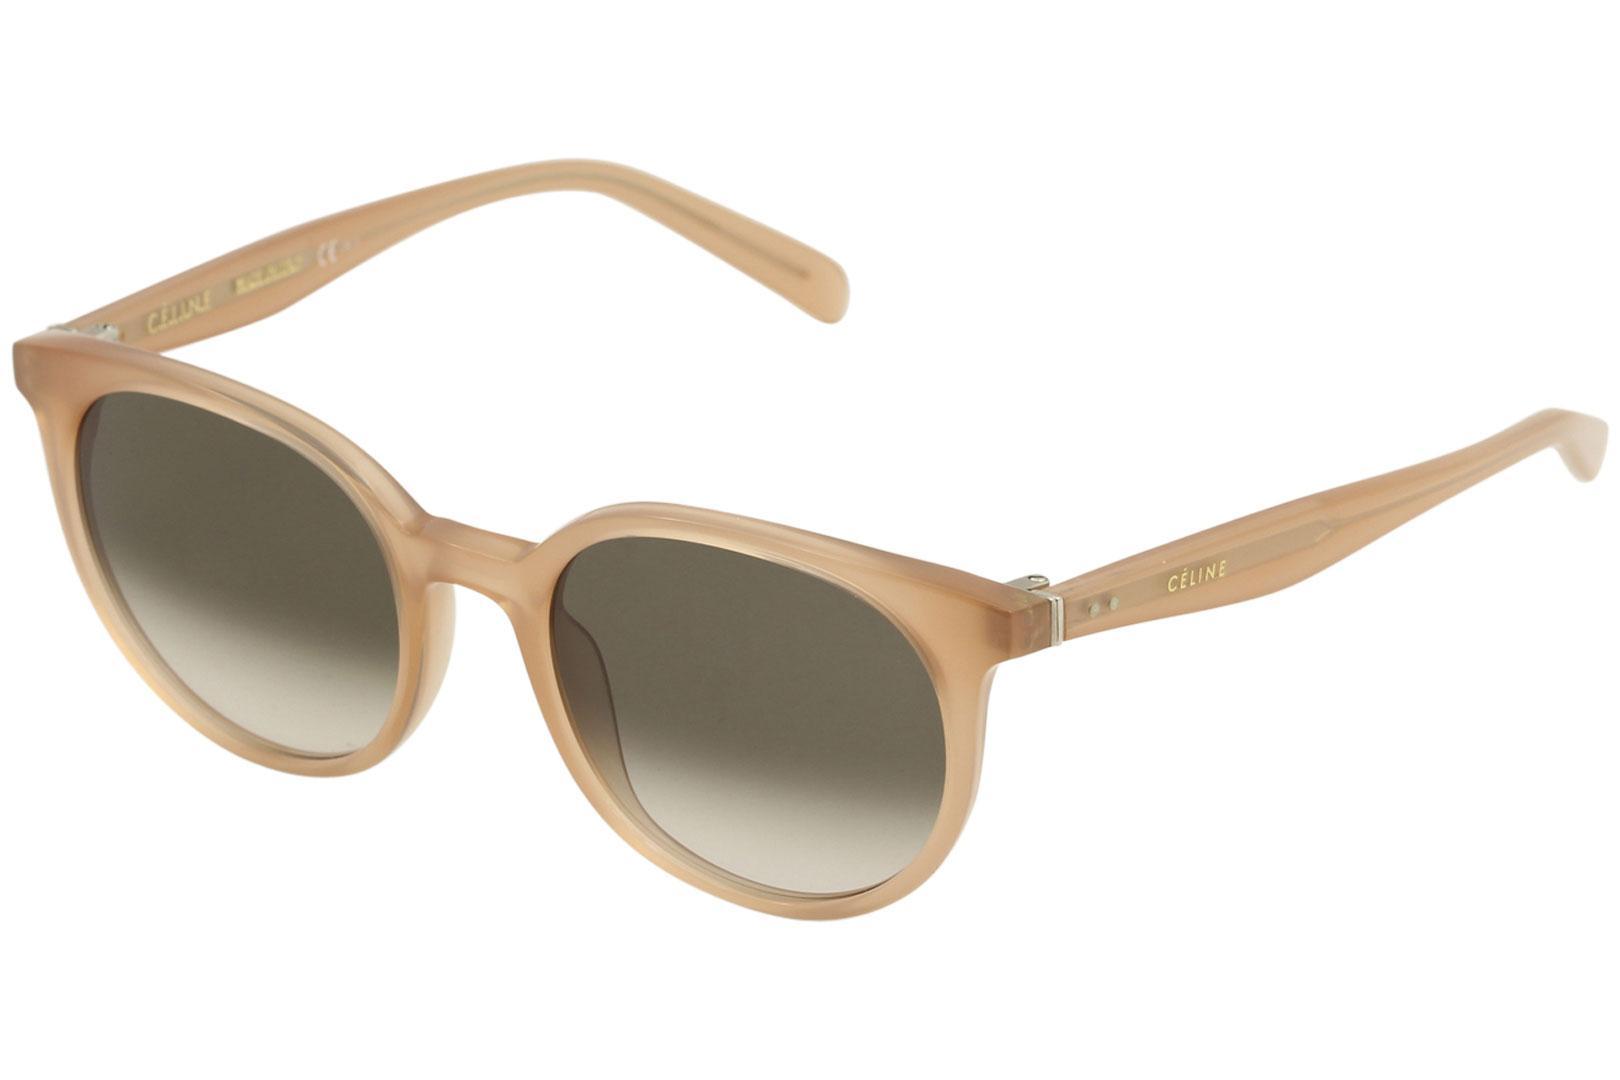 91e2673aec9 Celine Women s CL 41067S 41067 S Fashion Sunglasses